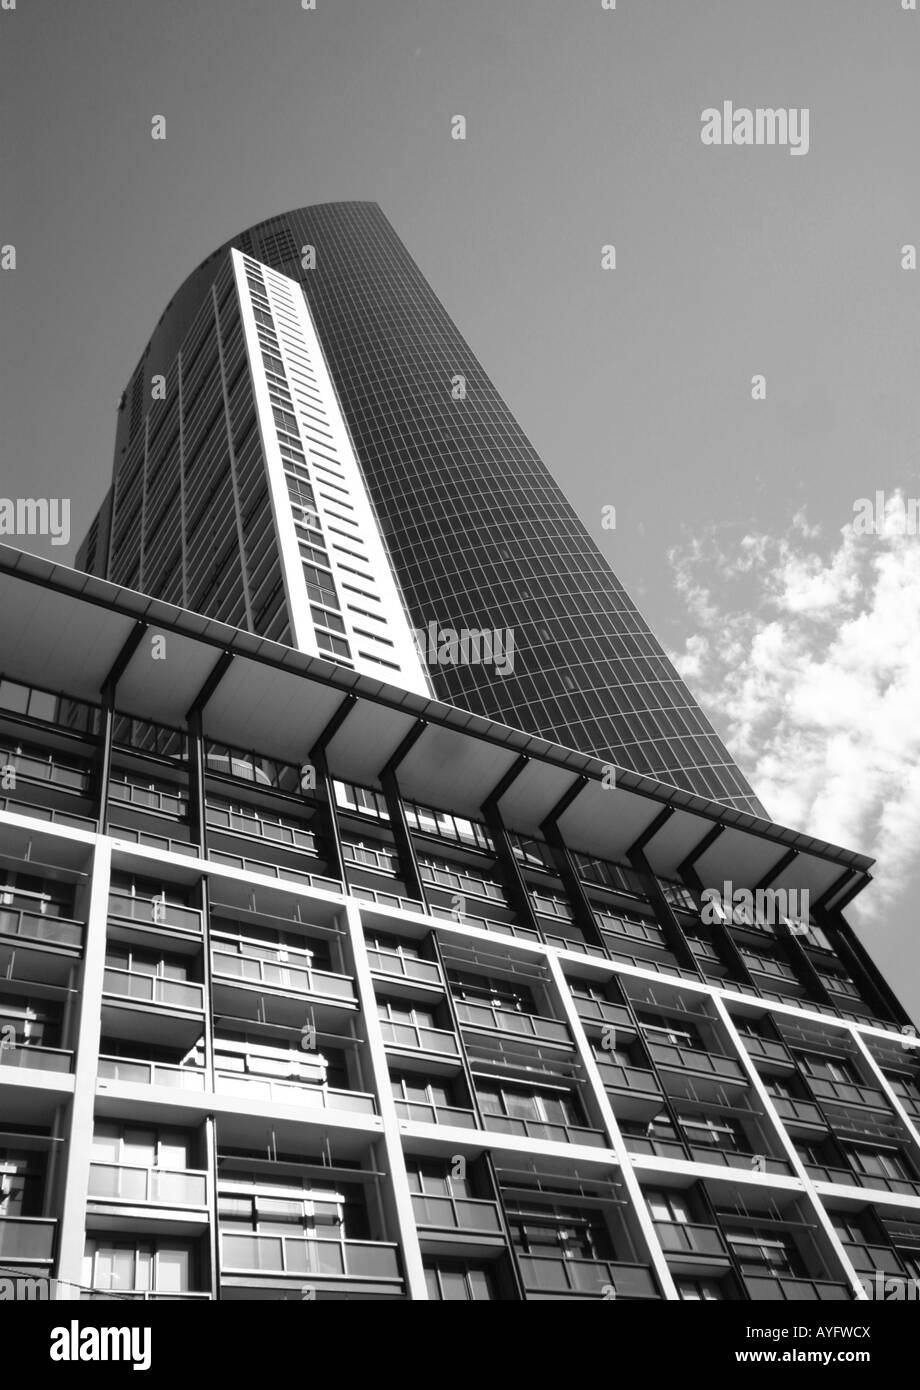 skyscrapers - melbourne australia - Stock Image